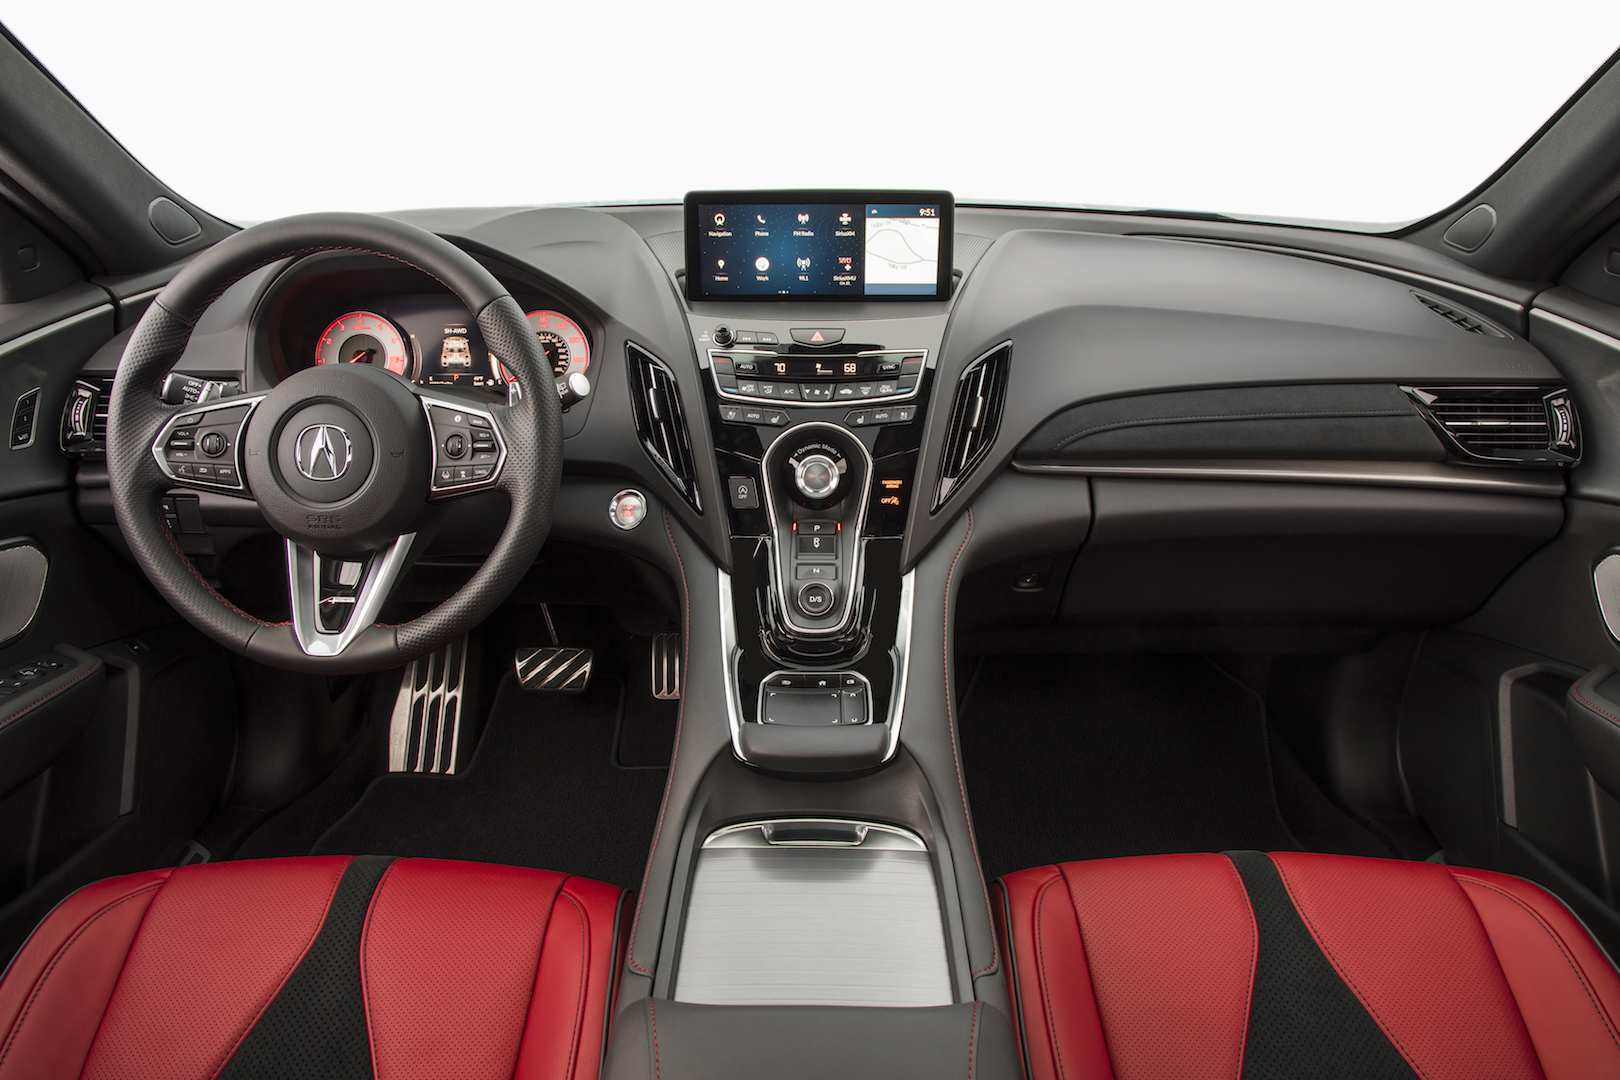 35 Great 2019 Acura Rdx Rumors Interior for 2019 Acura Rdx Rumors